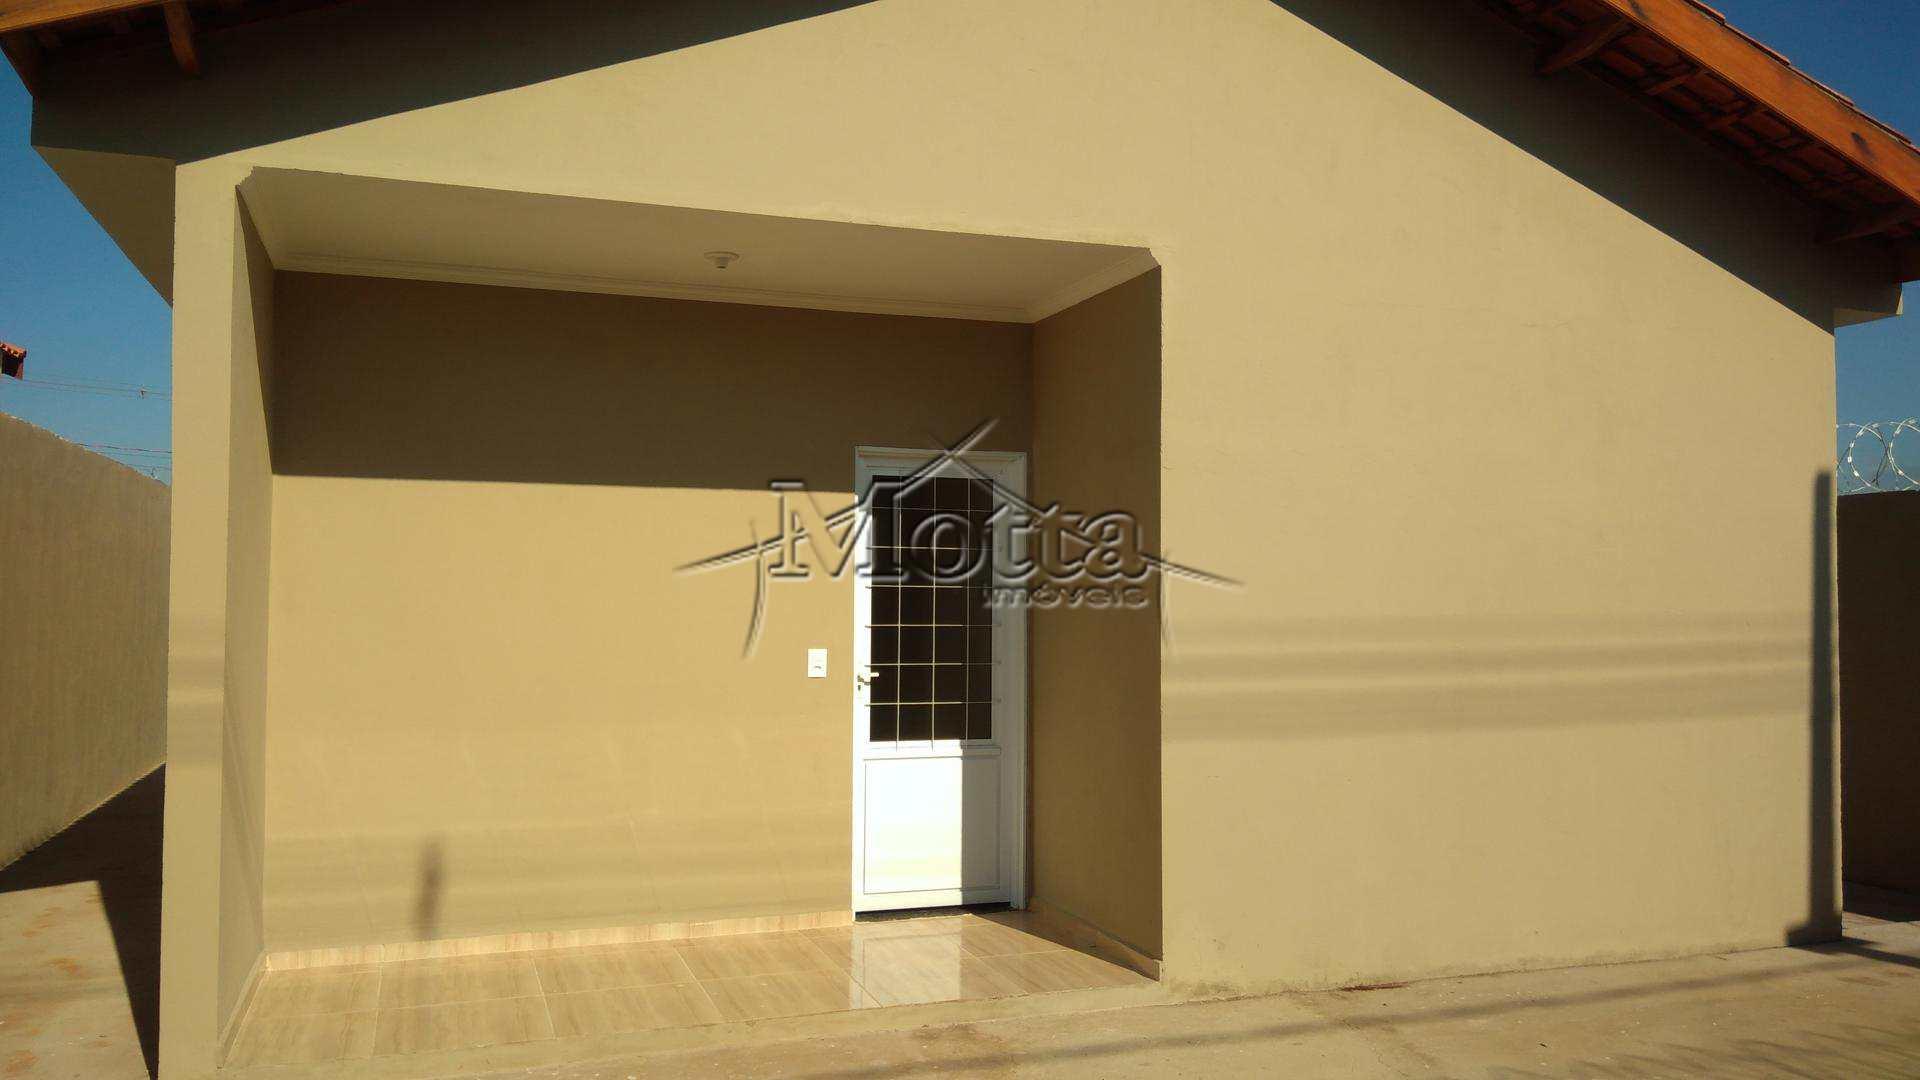 Casa 2 dorms, Jardim Aliança - Cod: 973